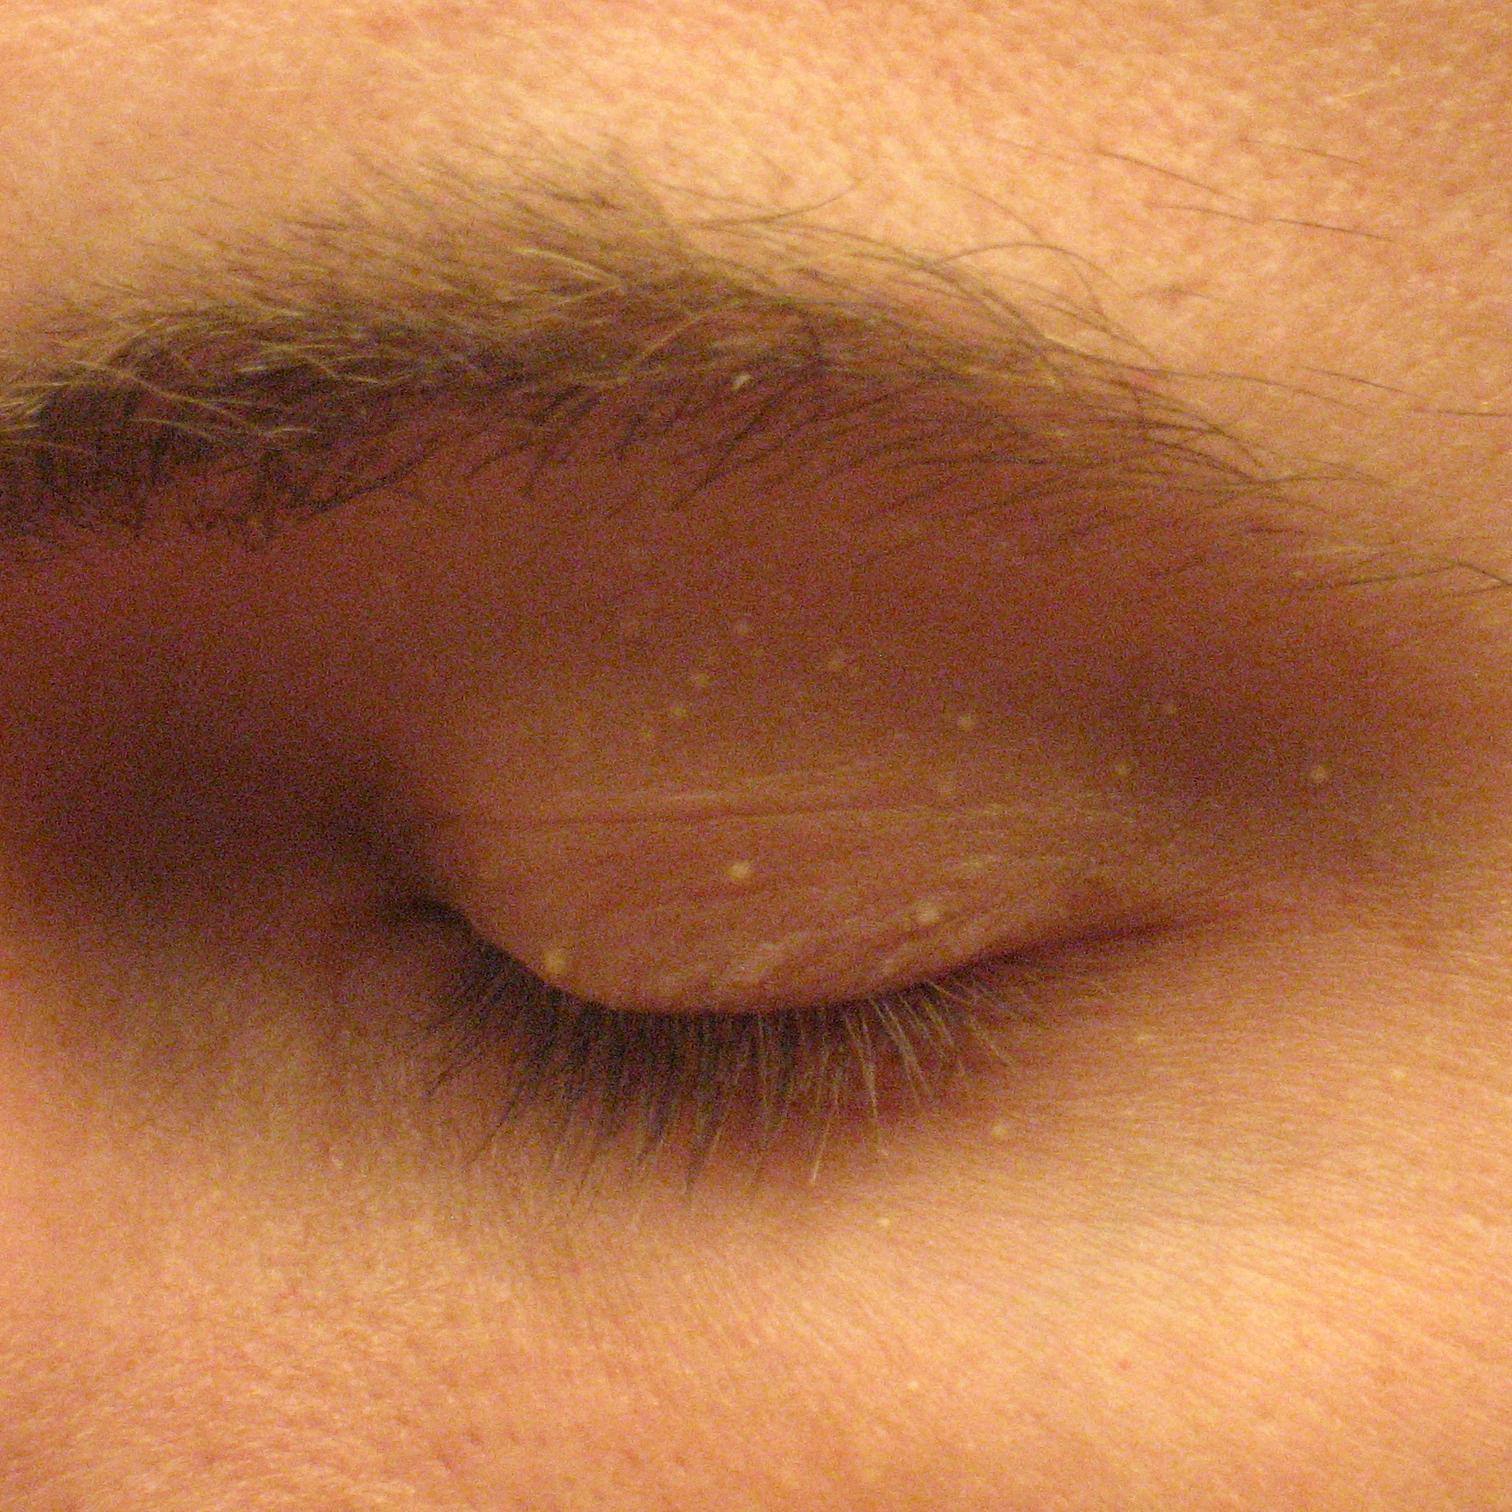 viral papilloma eyelid icd 10 cancer la plamani in metastaza